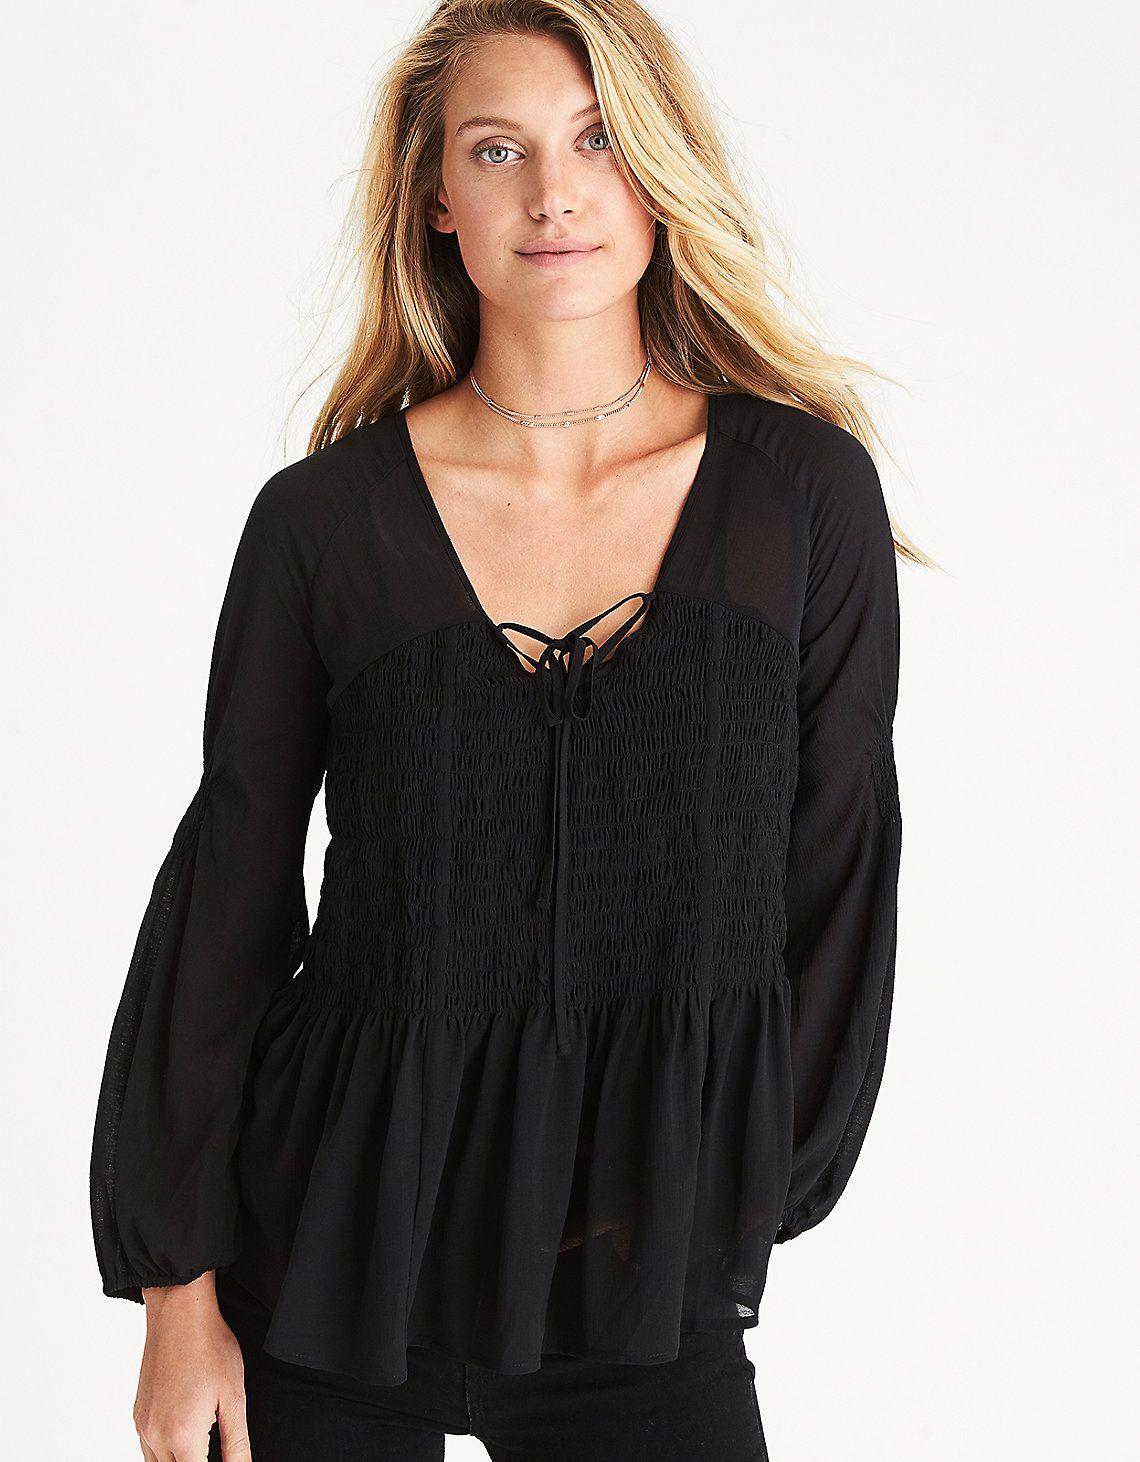 to wear - How to black a wear flowy top video